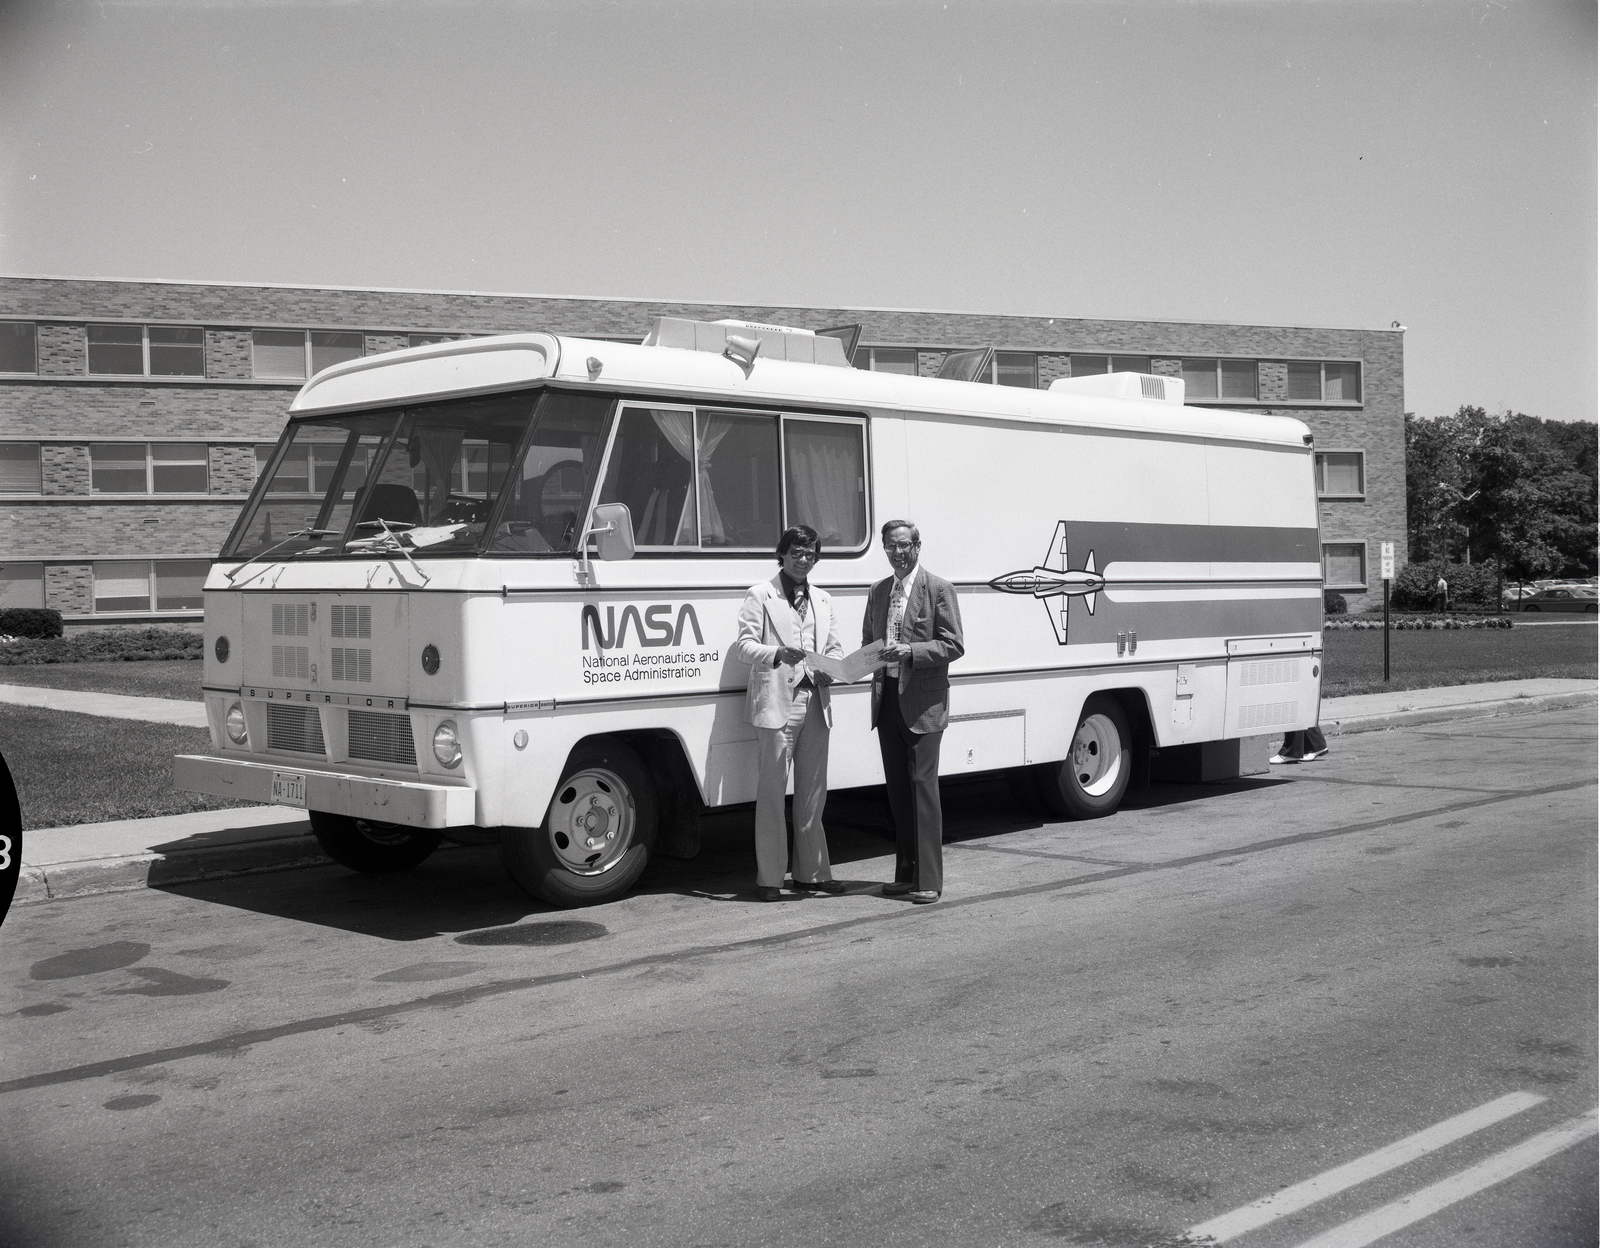 NASA VAN VISITING NASA LEWIS RESEARCH CENTER